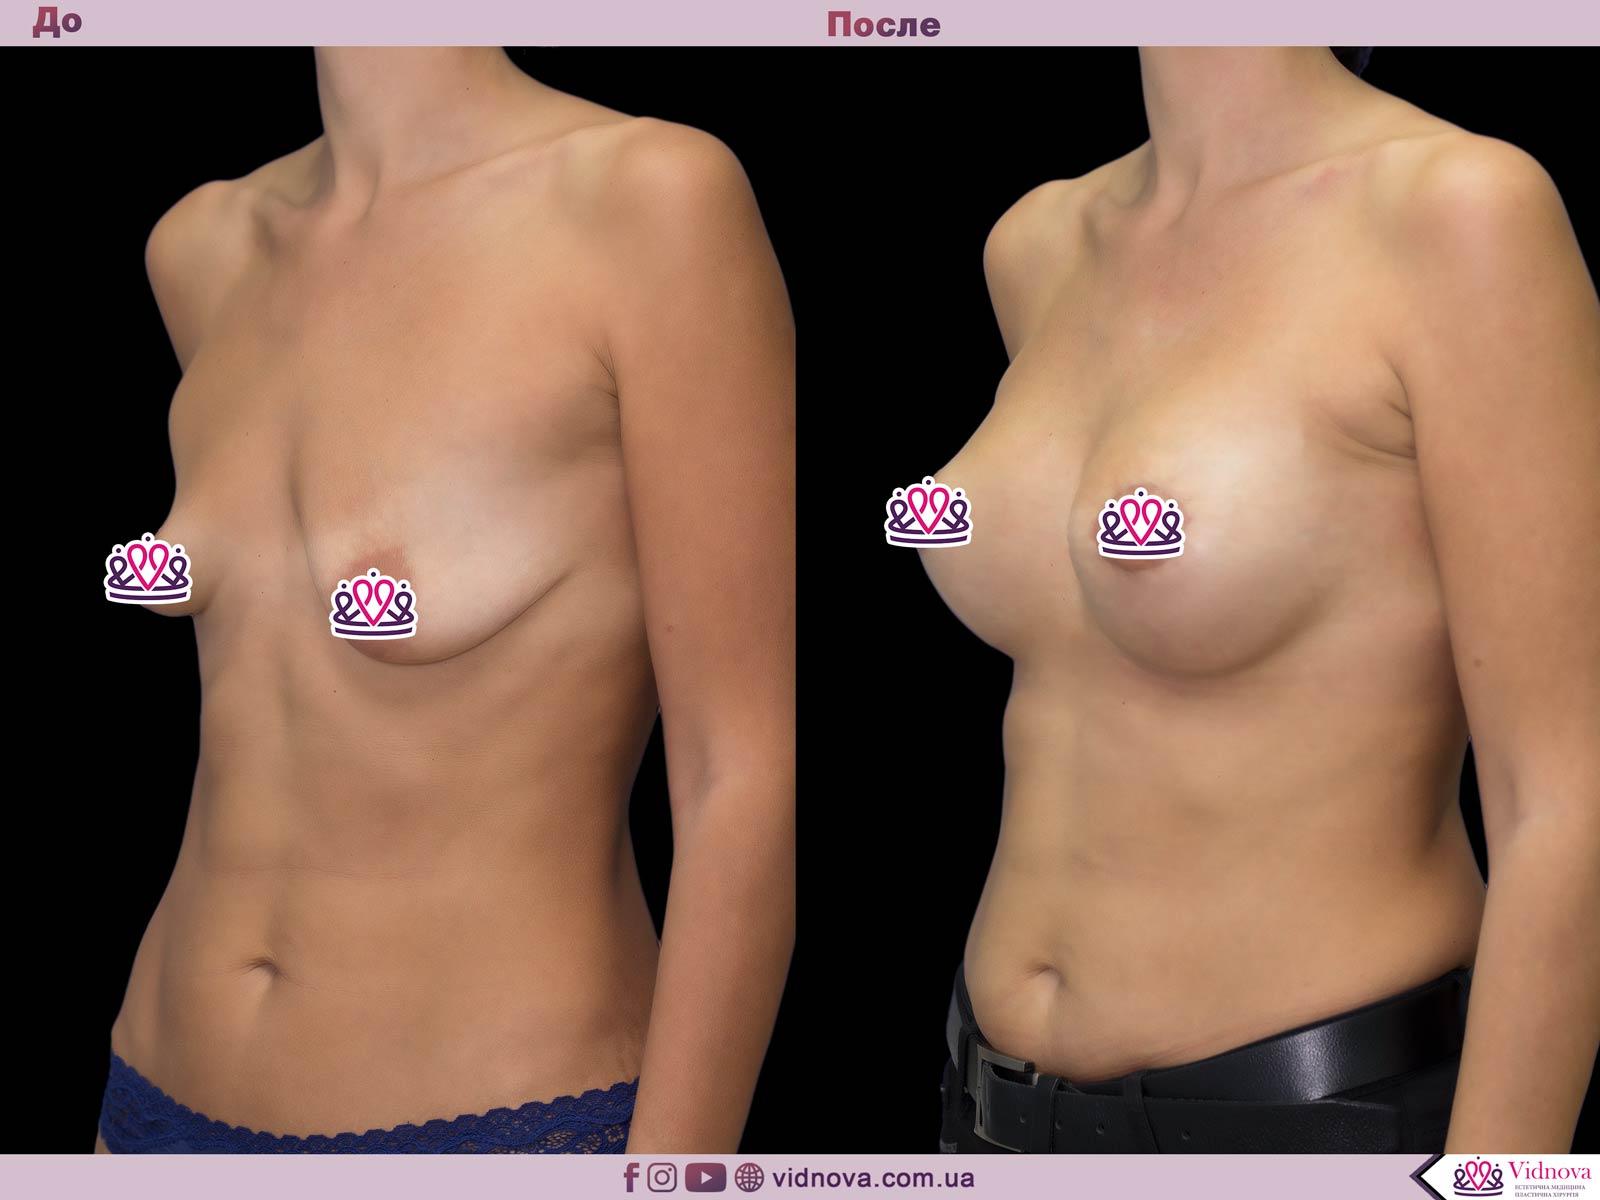 Подтяжка груди: Фото ДО и ПОСЛЕ - Пример №19-2 - Клиника Vidnova